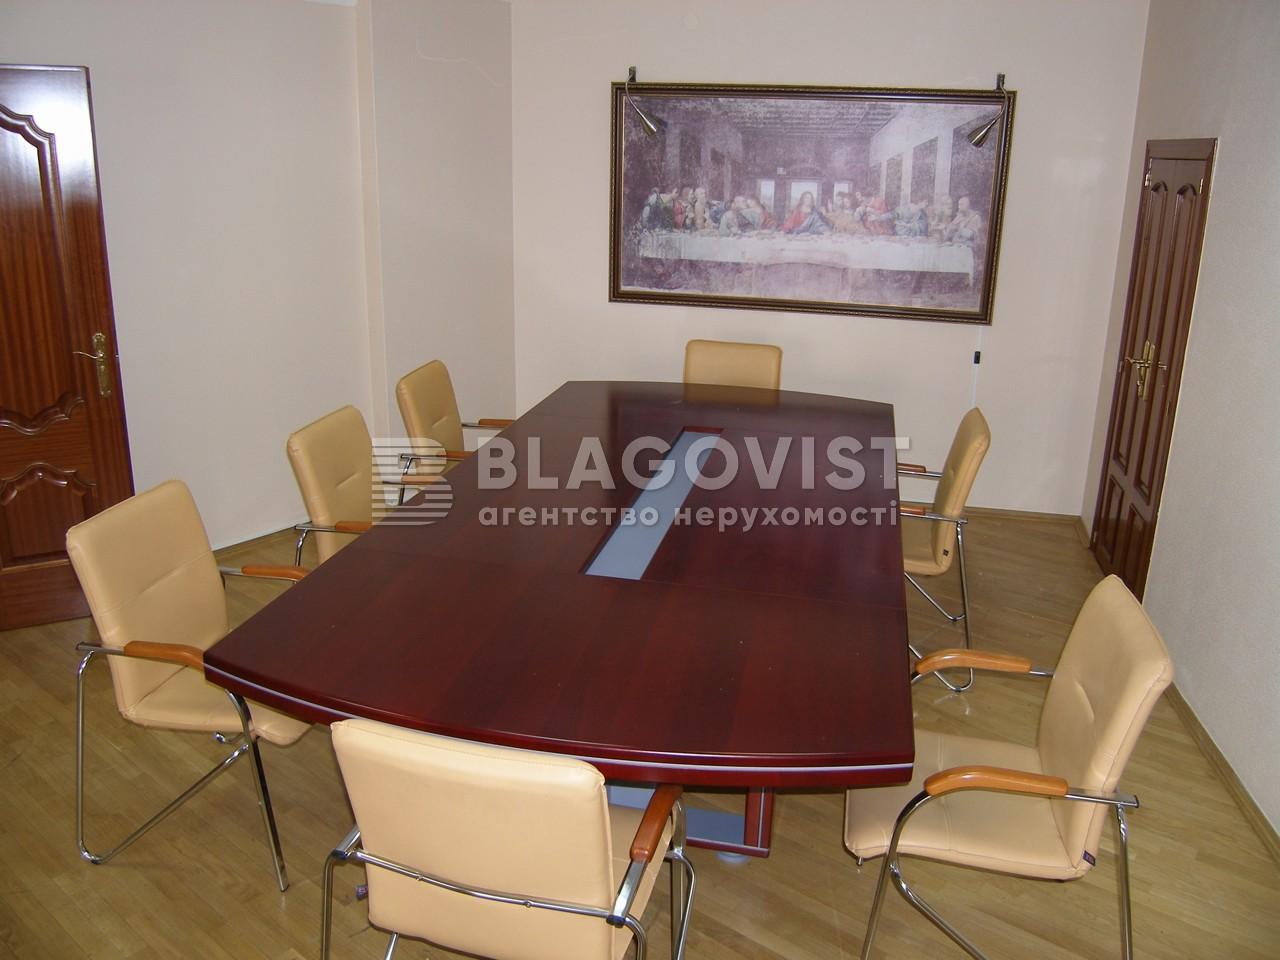 Бизнес-центр, H-37819, Петрозаводска, Киев - Фото 9